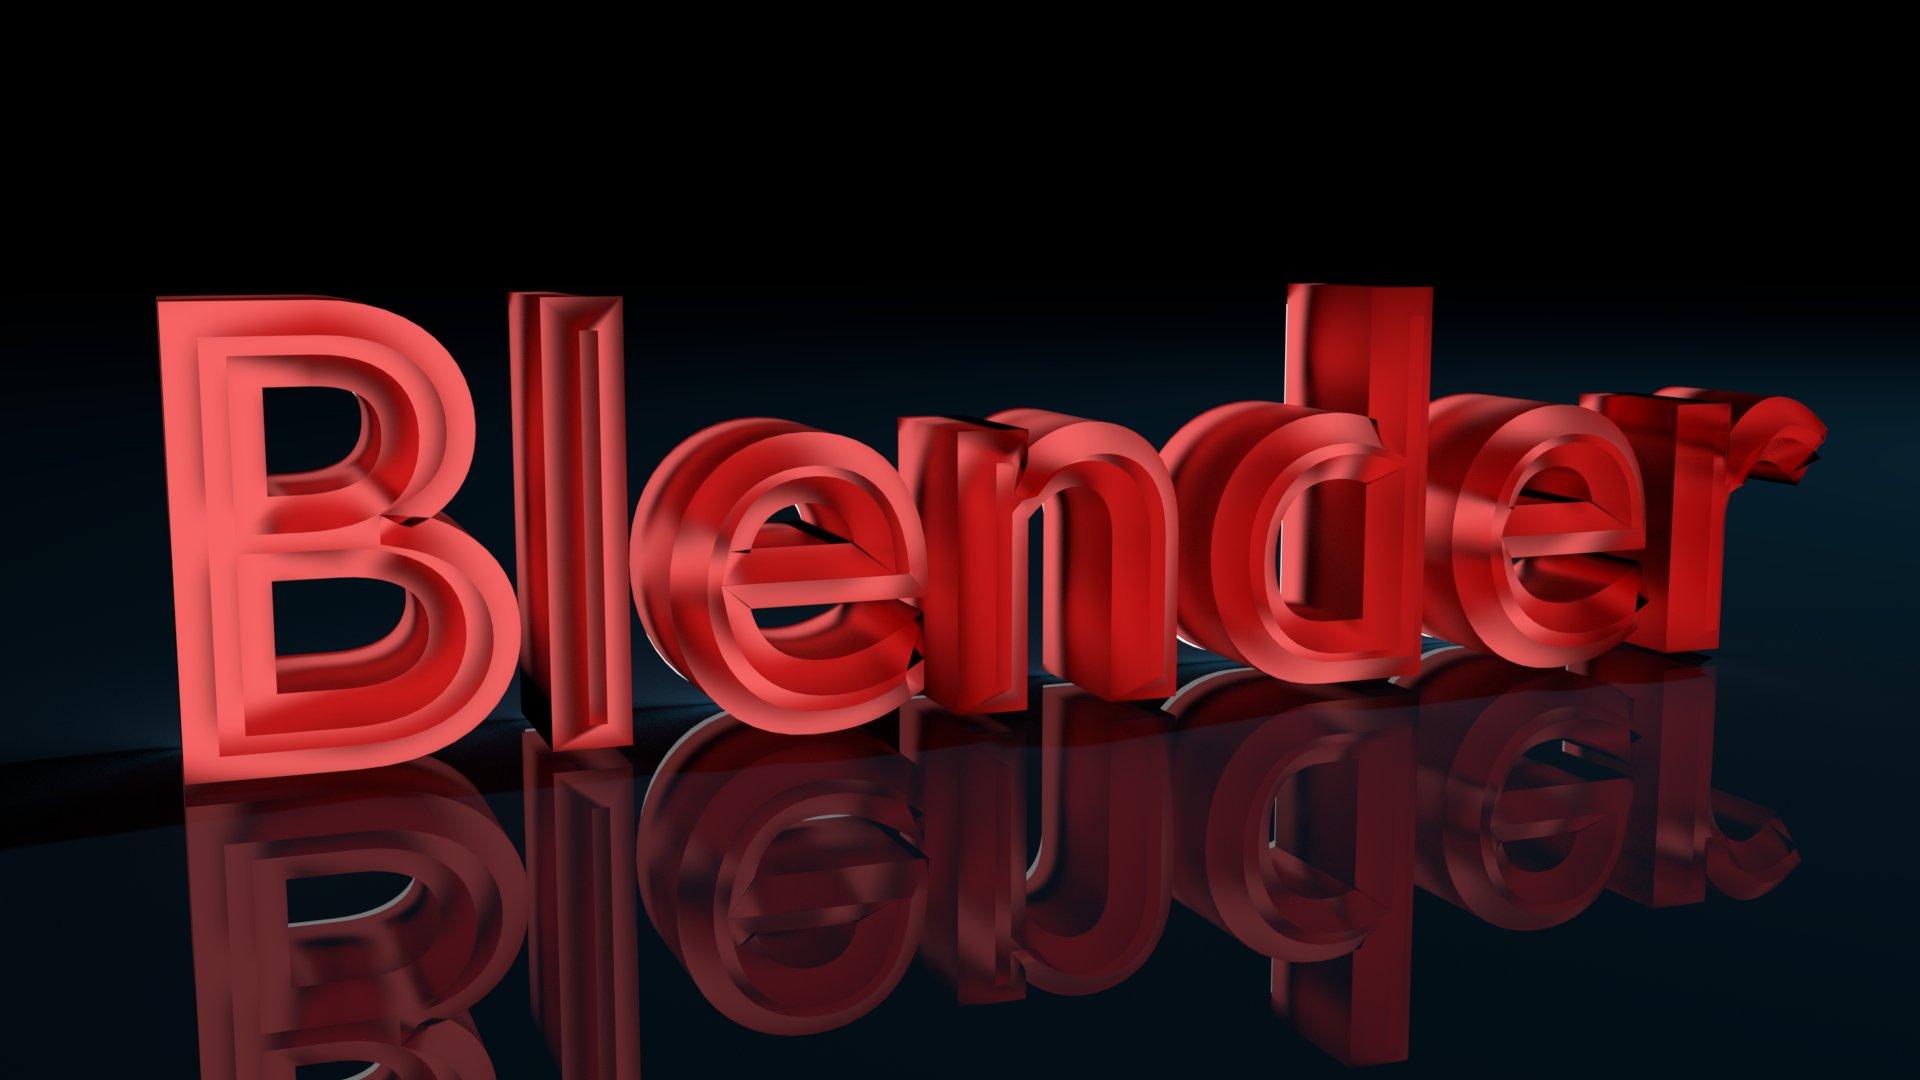 Blender intro class - volume zero